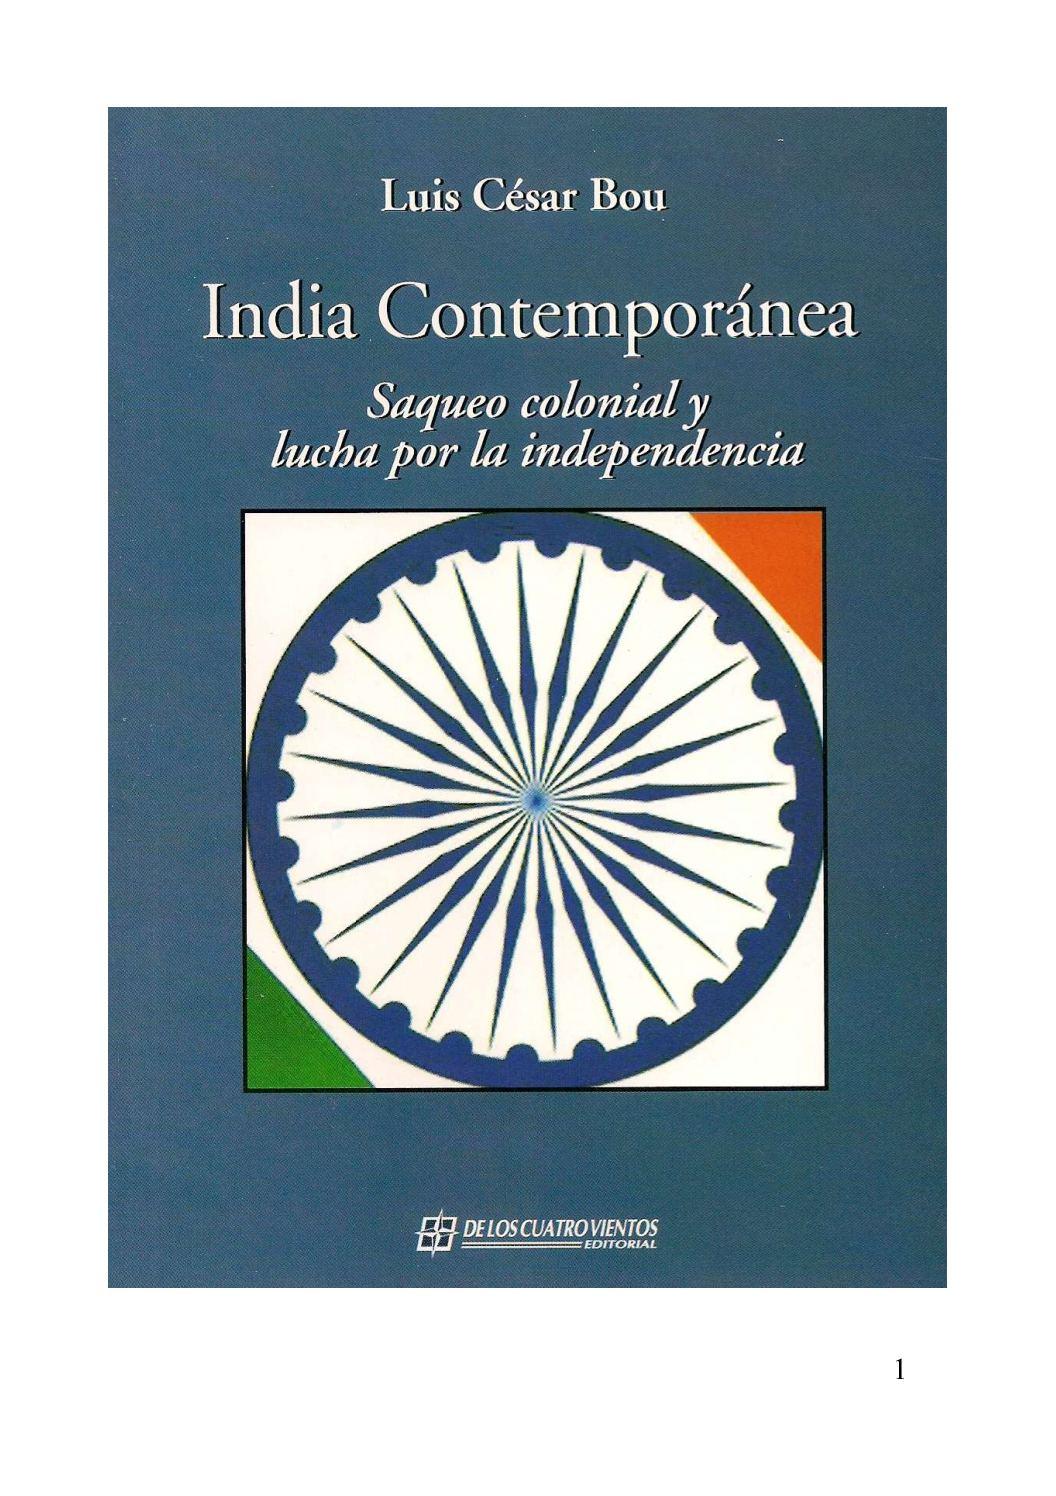 Calaméo - Luis César Bou. INDIA CONTEMPORANEA: SAQUEO COLONIAL Y ...